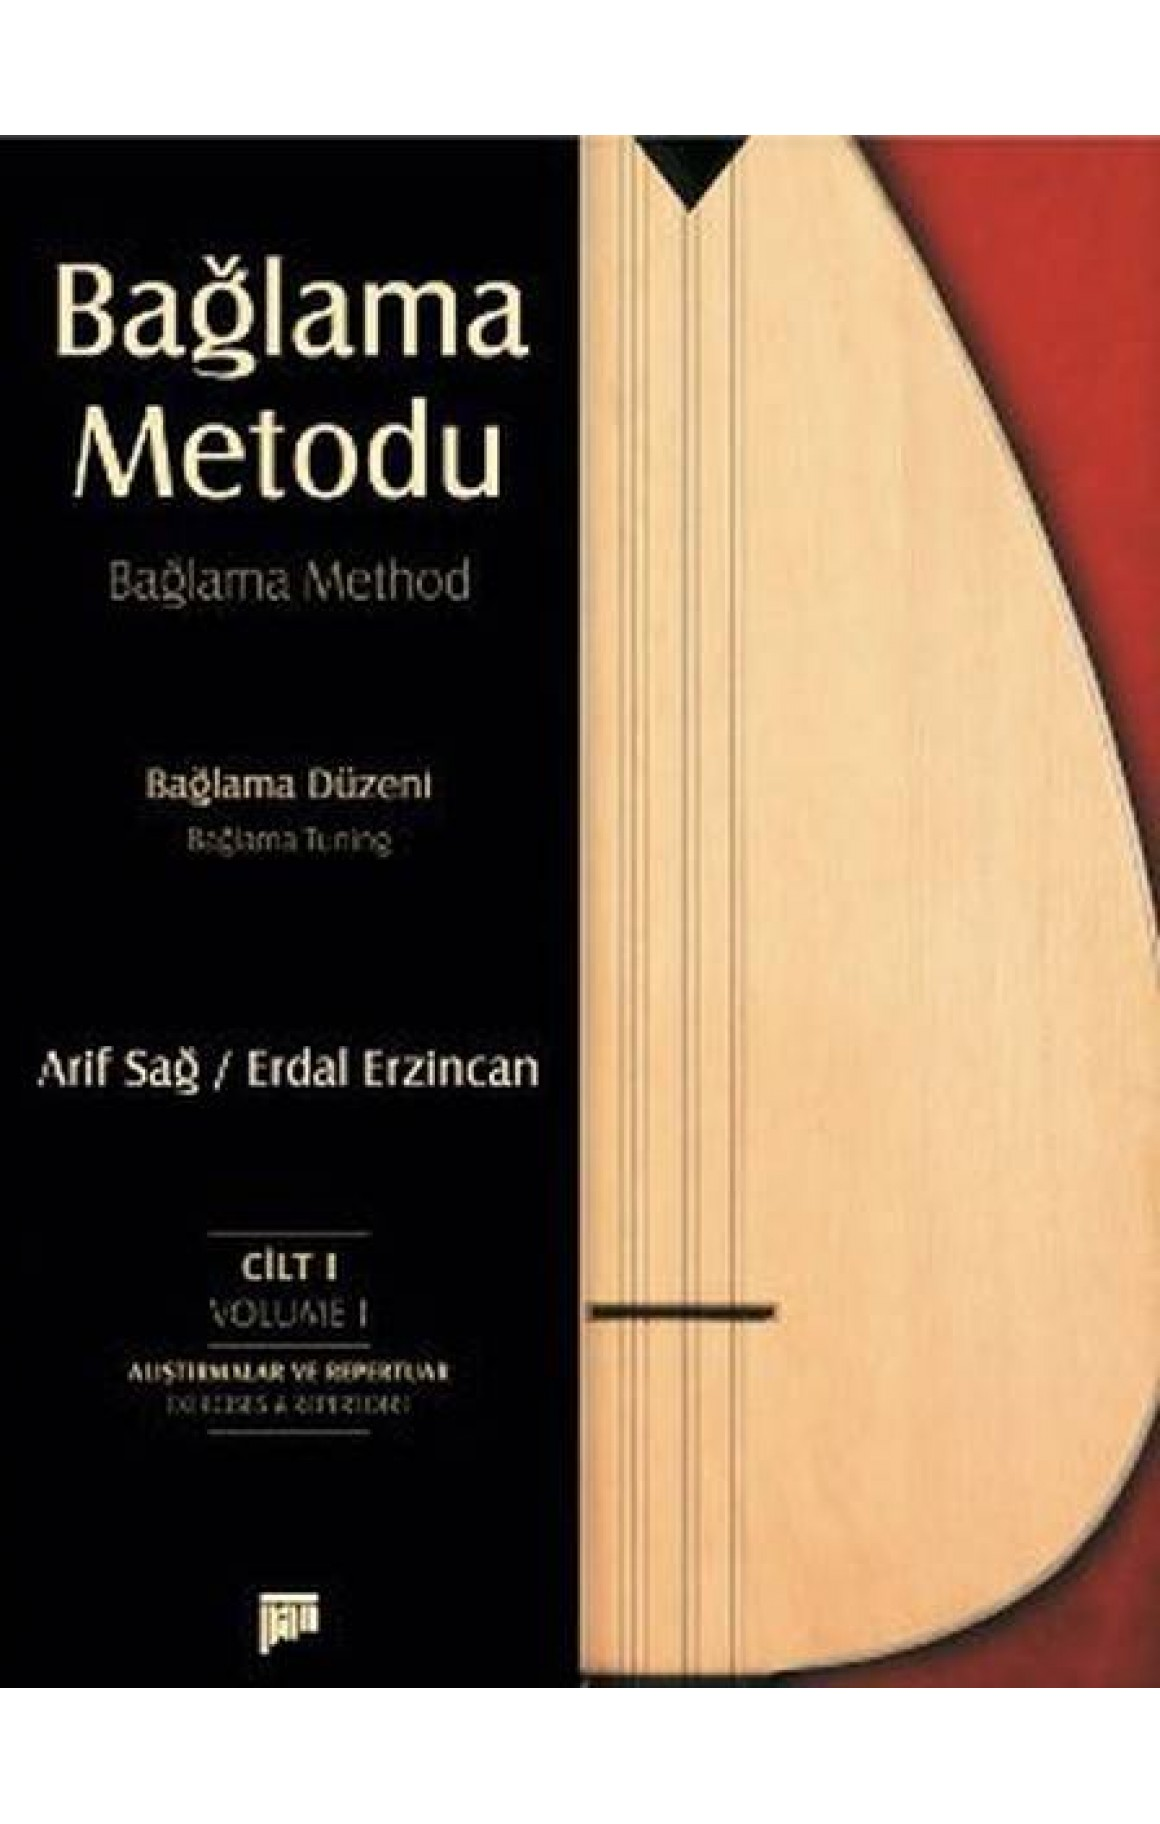 Bağlama Metodu / Bağlama Method (2 Cilt)